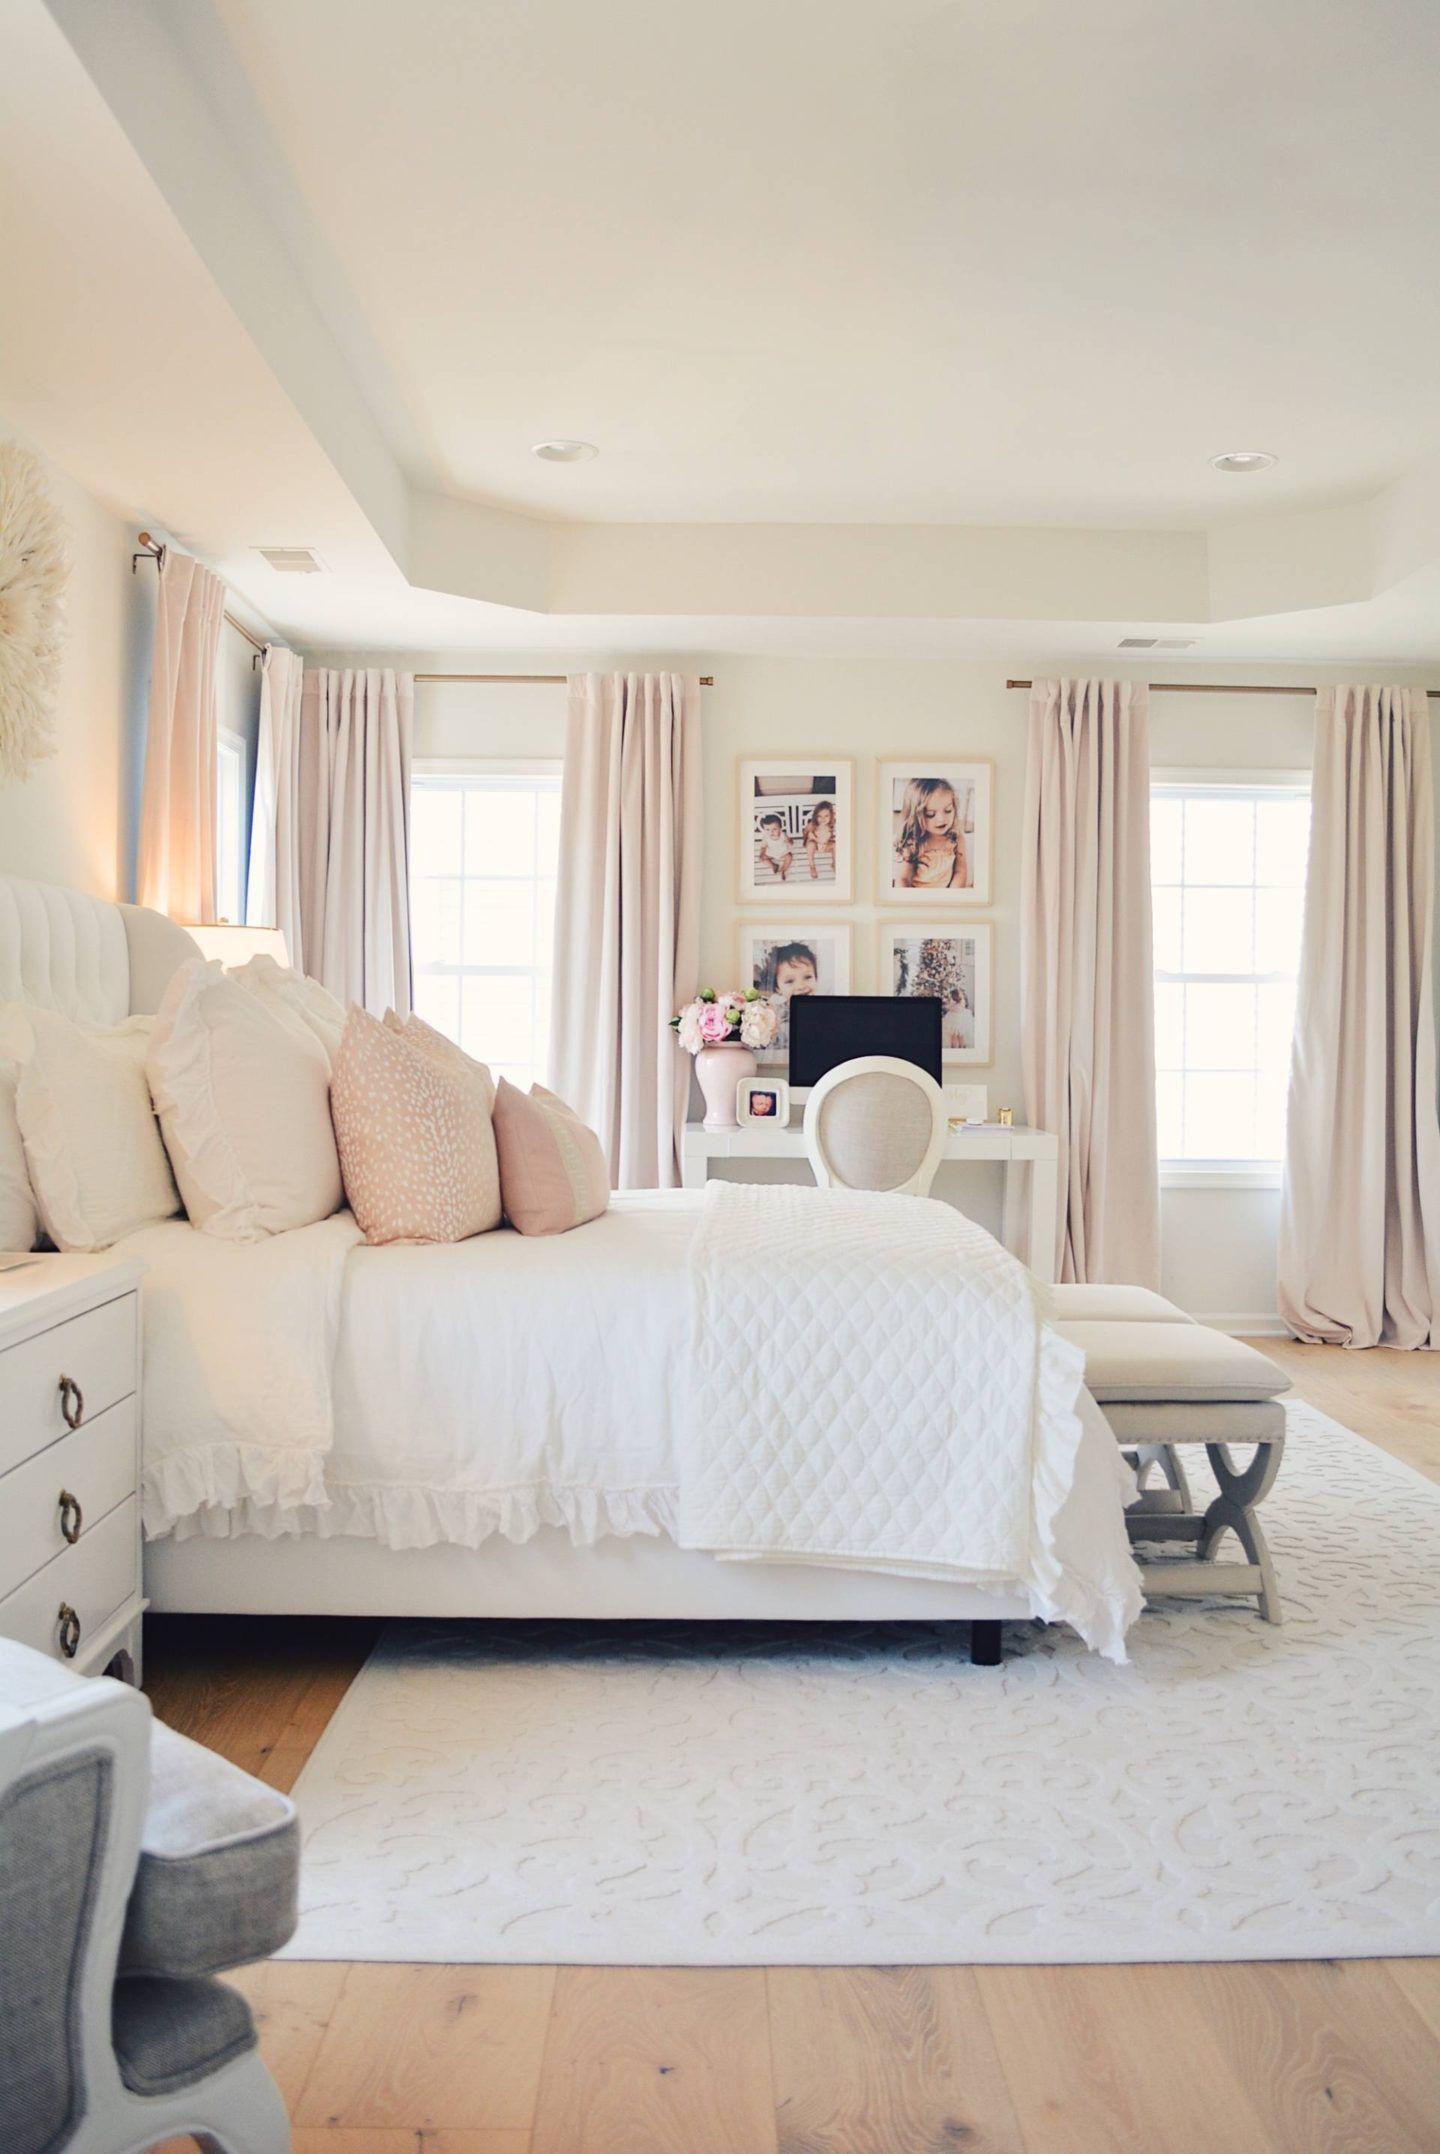 Elegant White Master Bedroom Blush Decorative Pillows The Pink Dream Master Bedroom Makeover White Master Bedroom Bedroom Inspirations